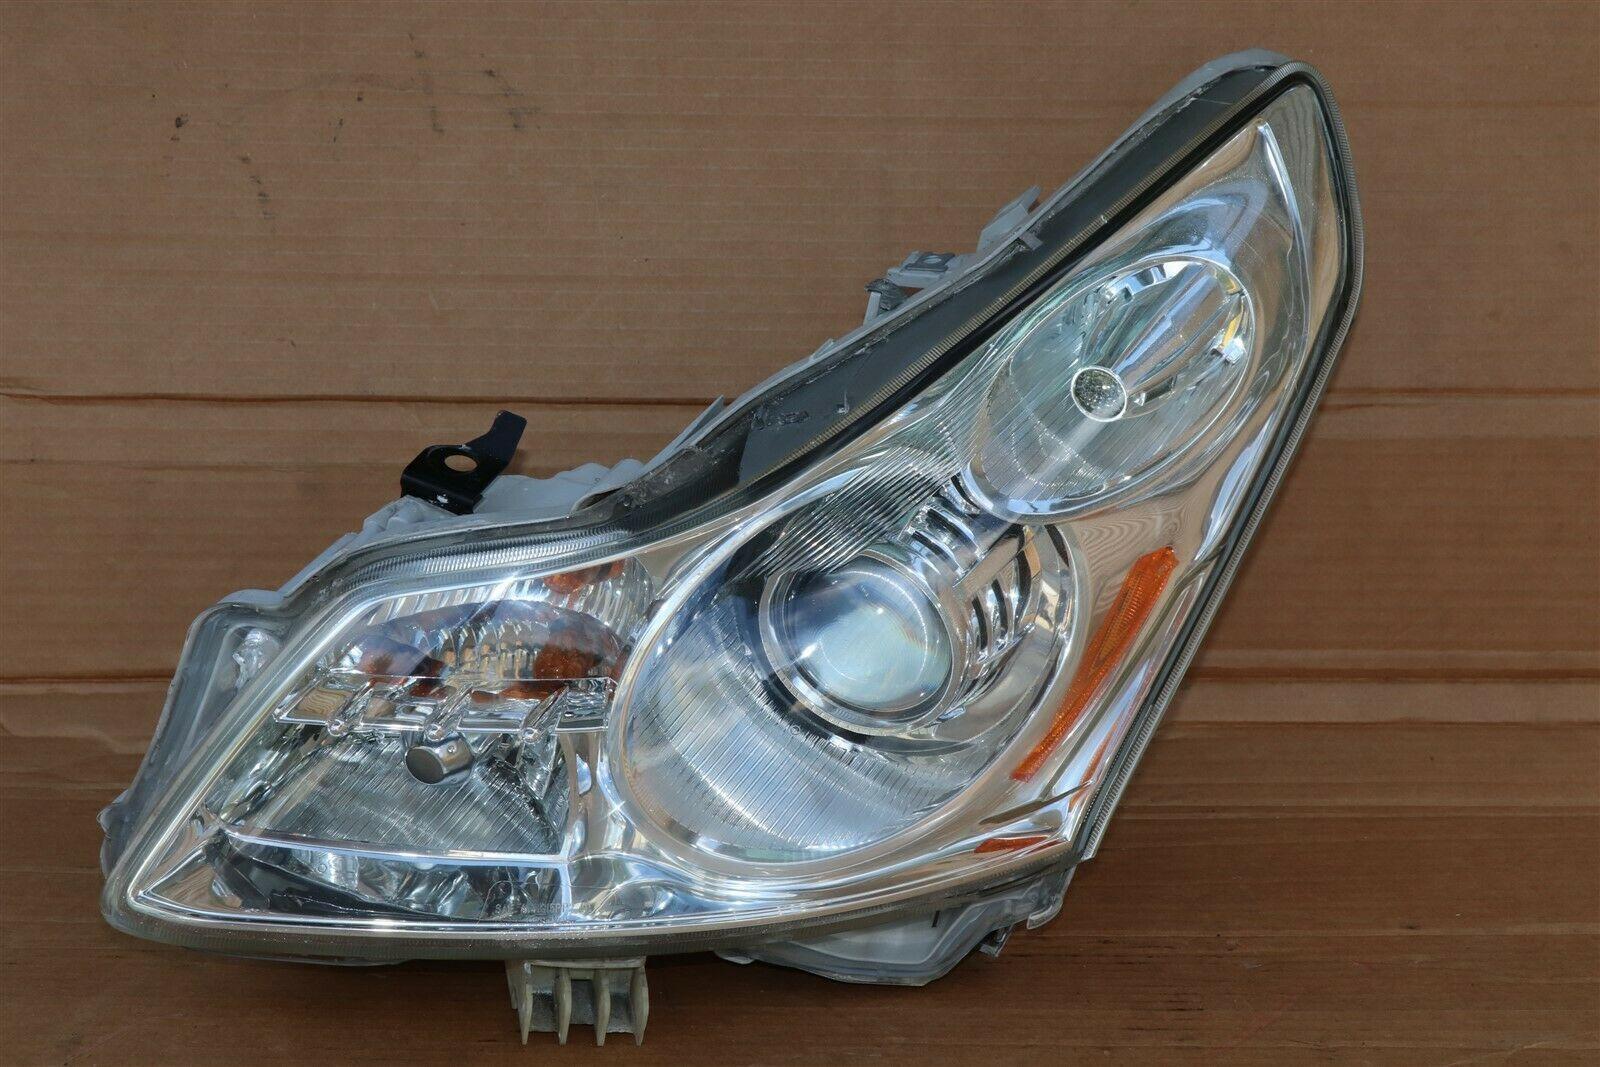 07-09 Infiniti G35 G37 4door Sedan Xenon HID HeadLight Lamp Driver Left LH